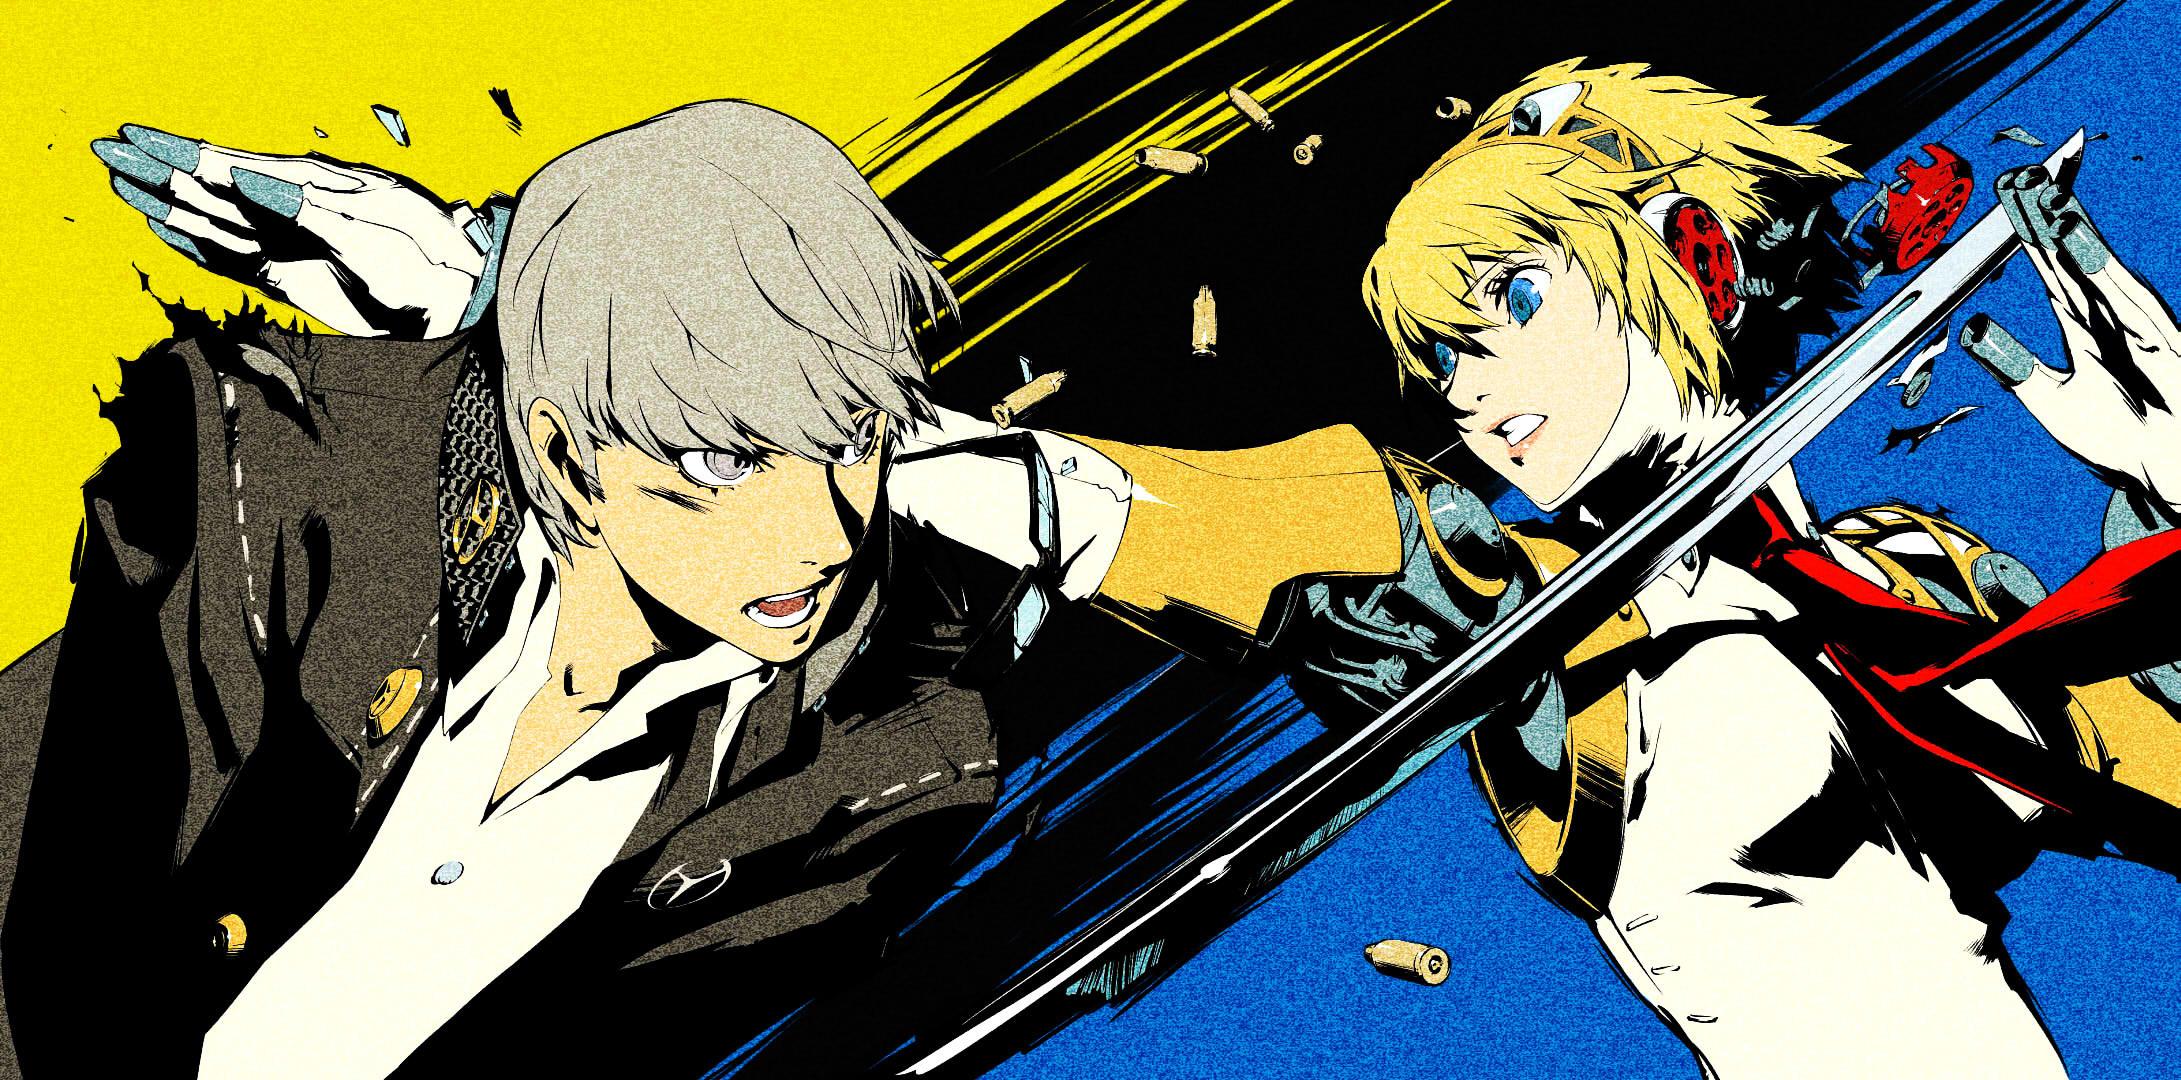 Persona Series Persona 4 Persona 3 Narukami Yuu Aigis Fresh New Hd Wallpaper  [Your Popular